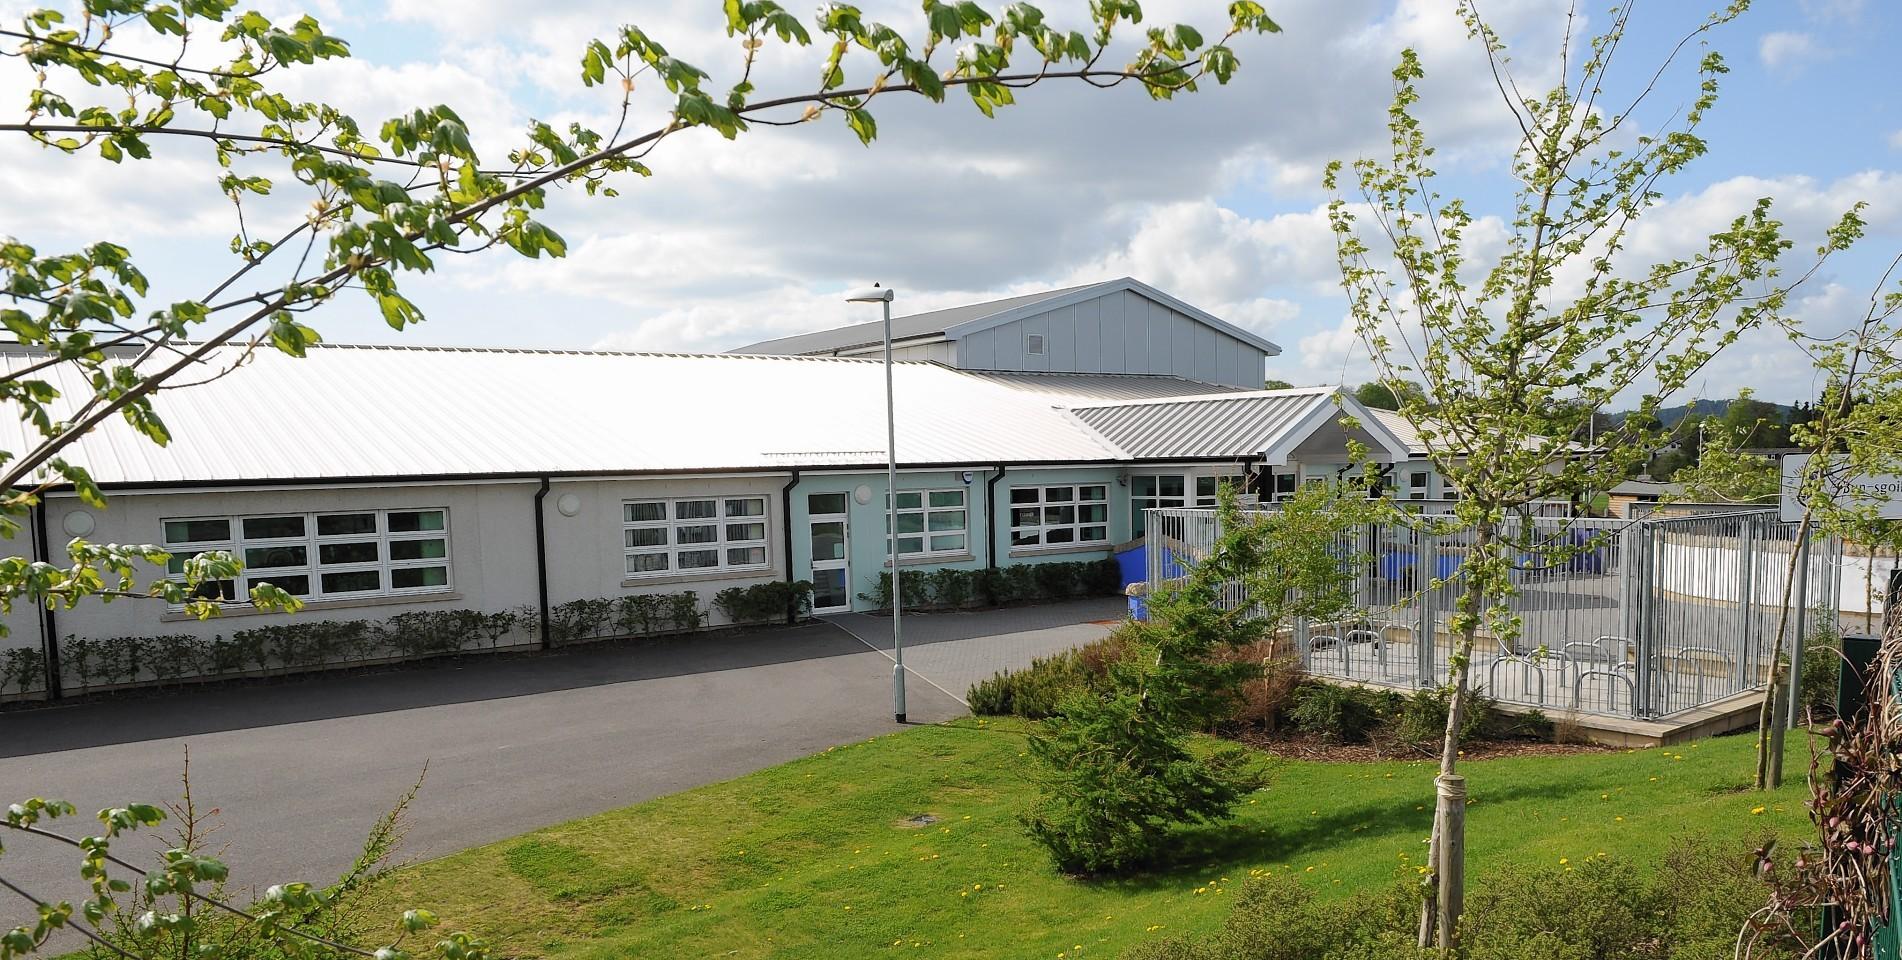 The Inverness Gaelic School